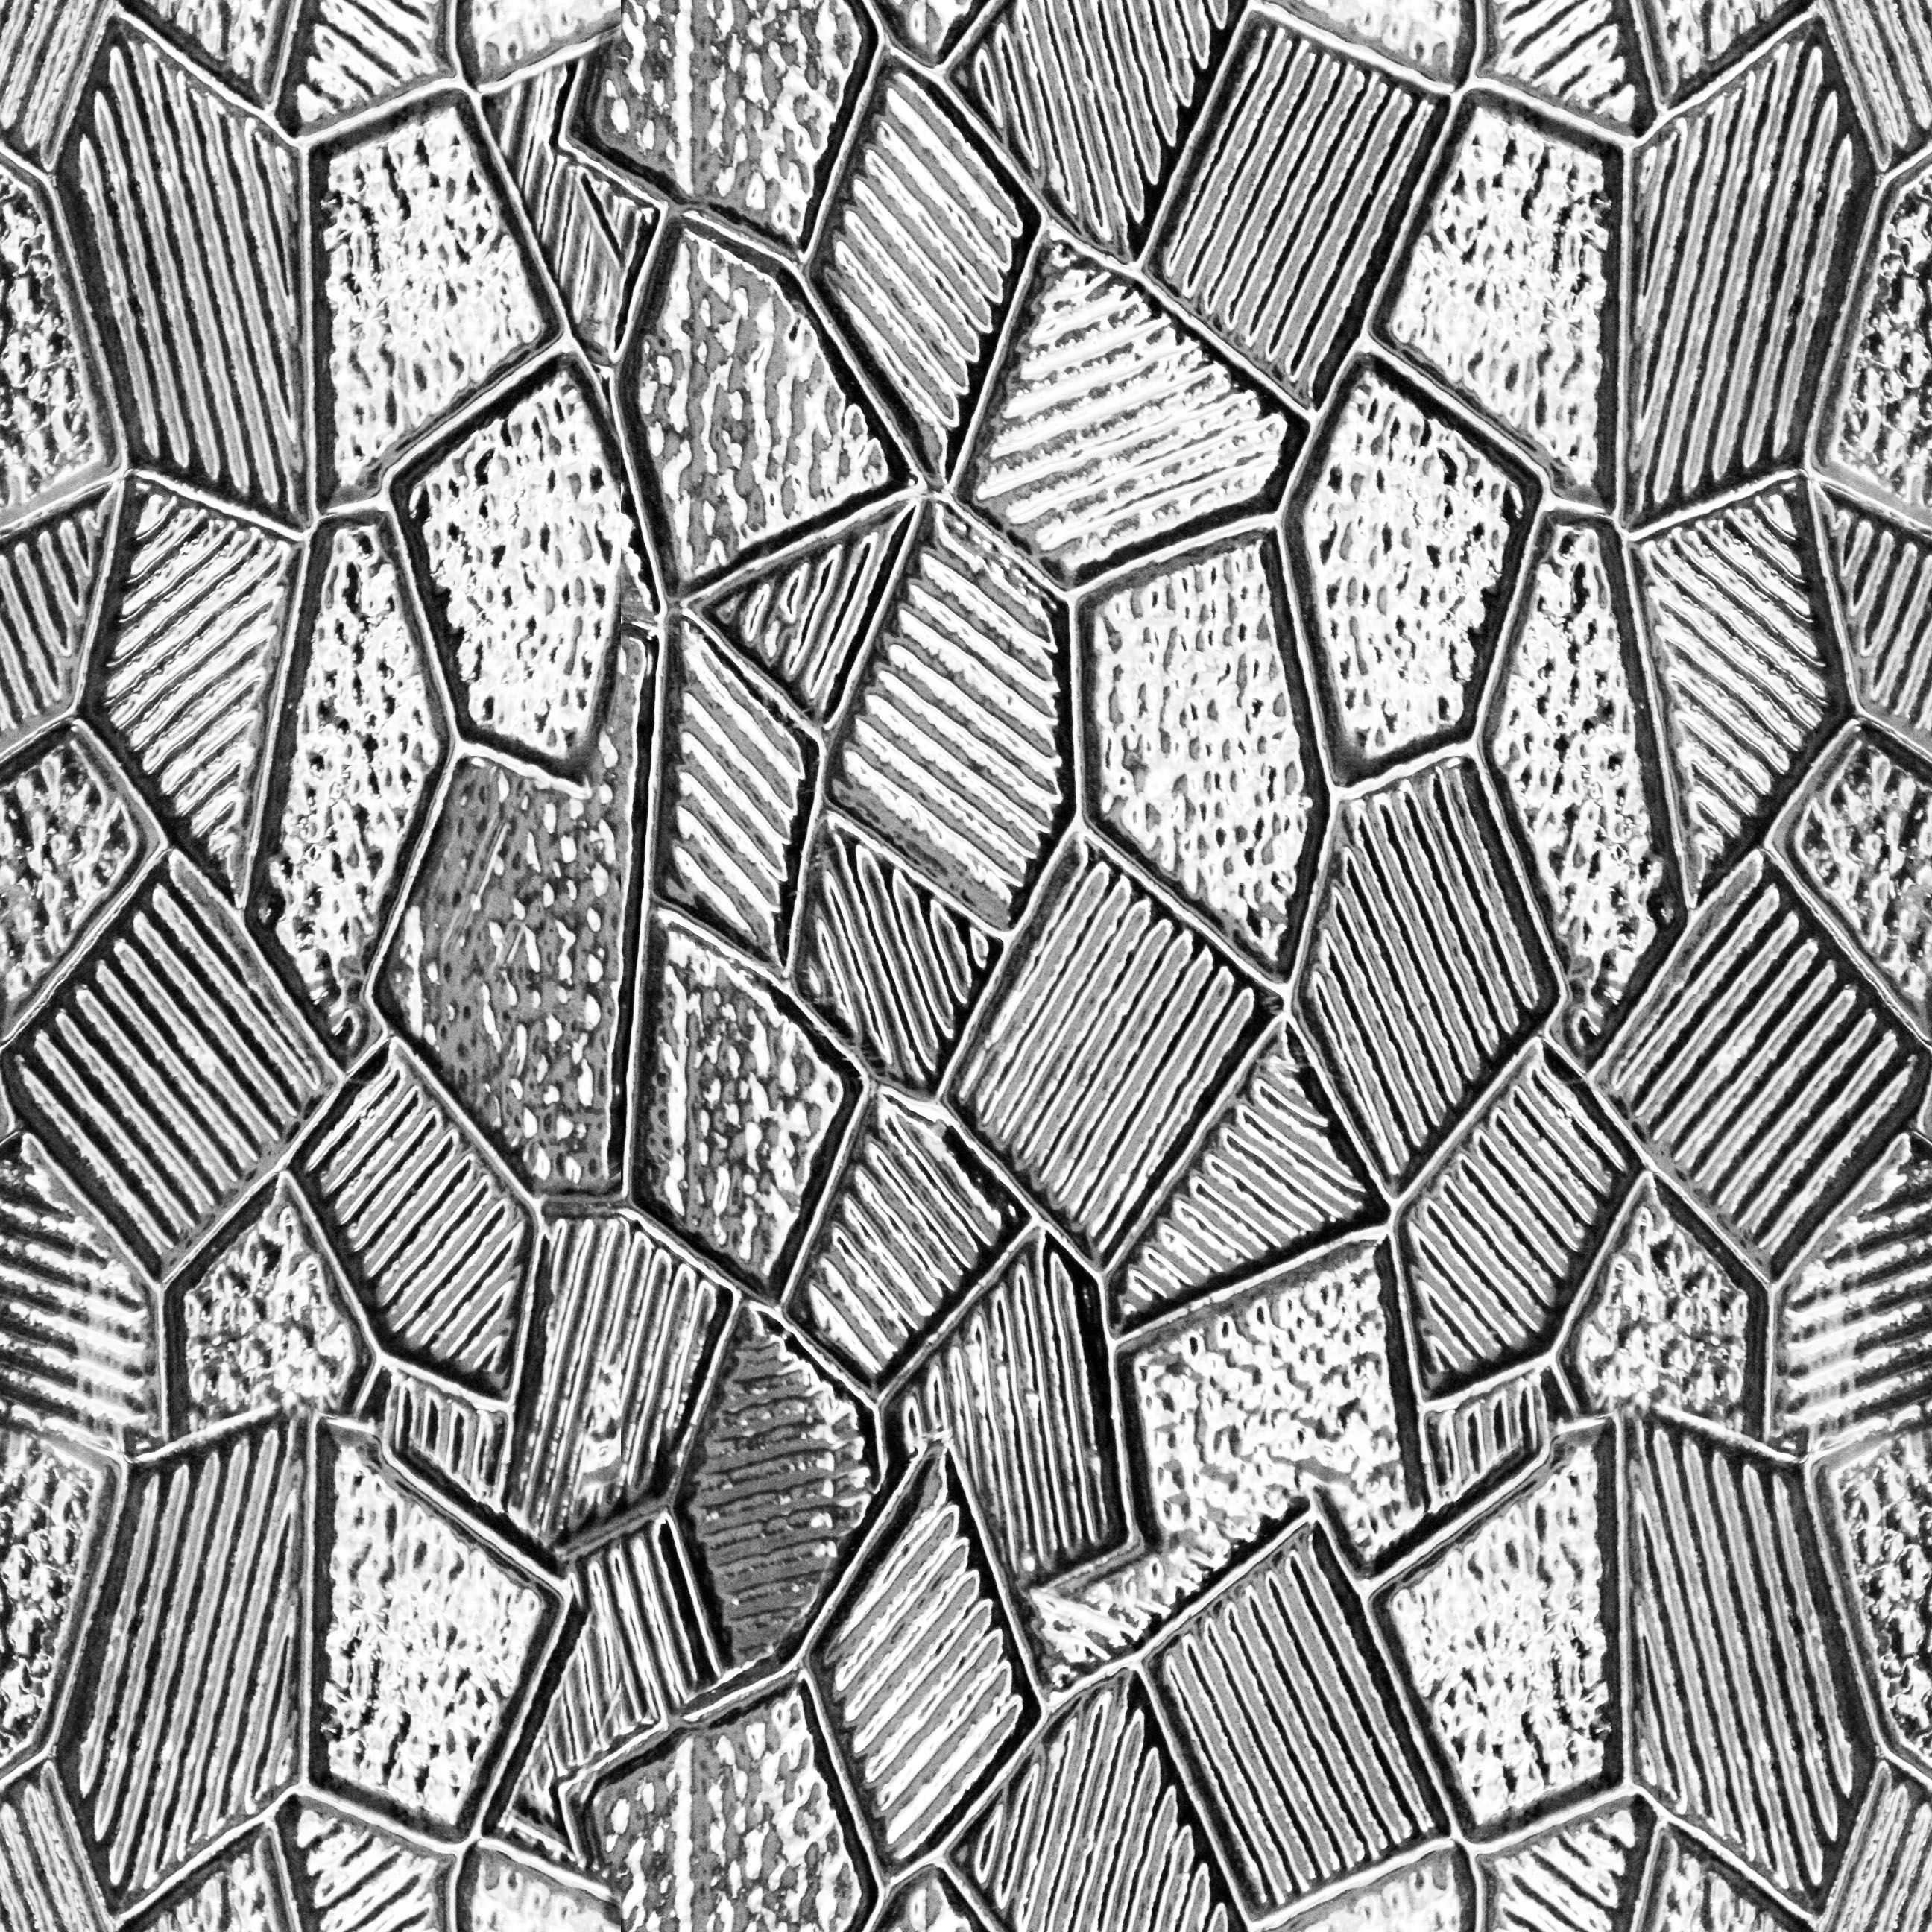 Line Texture Images : Textured glass bump map g line texture